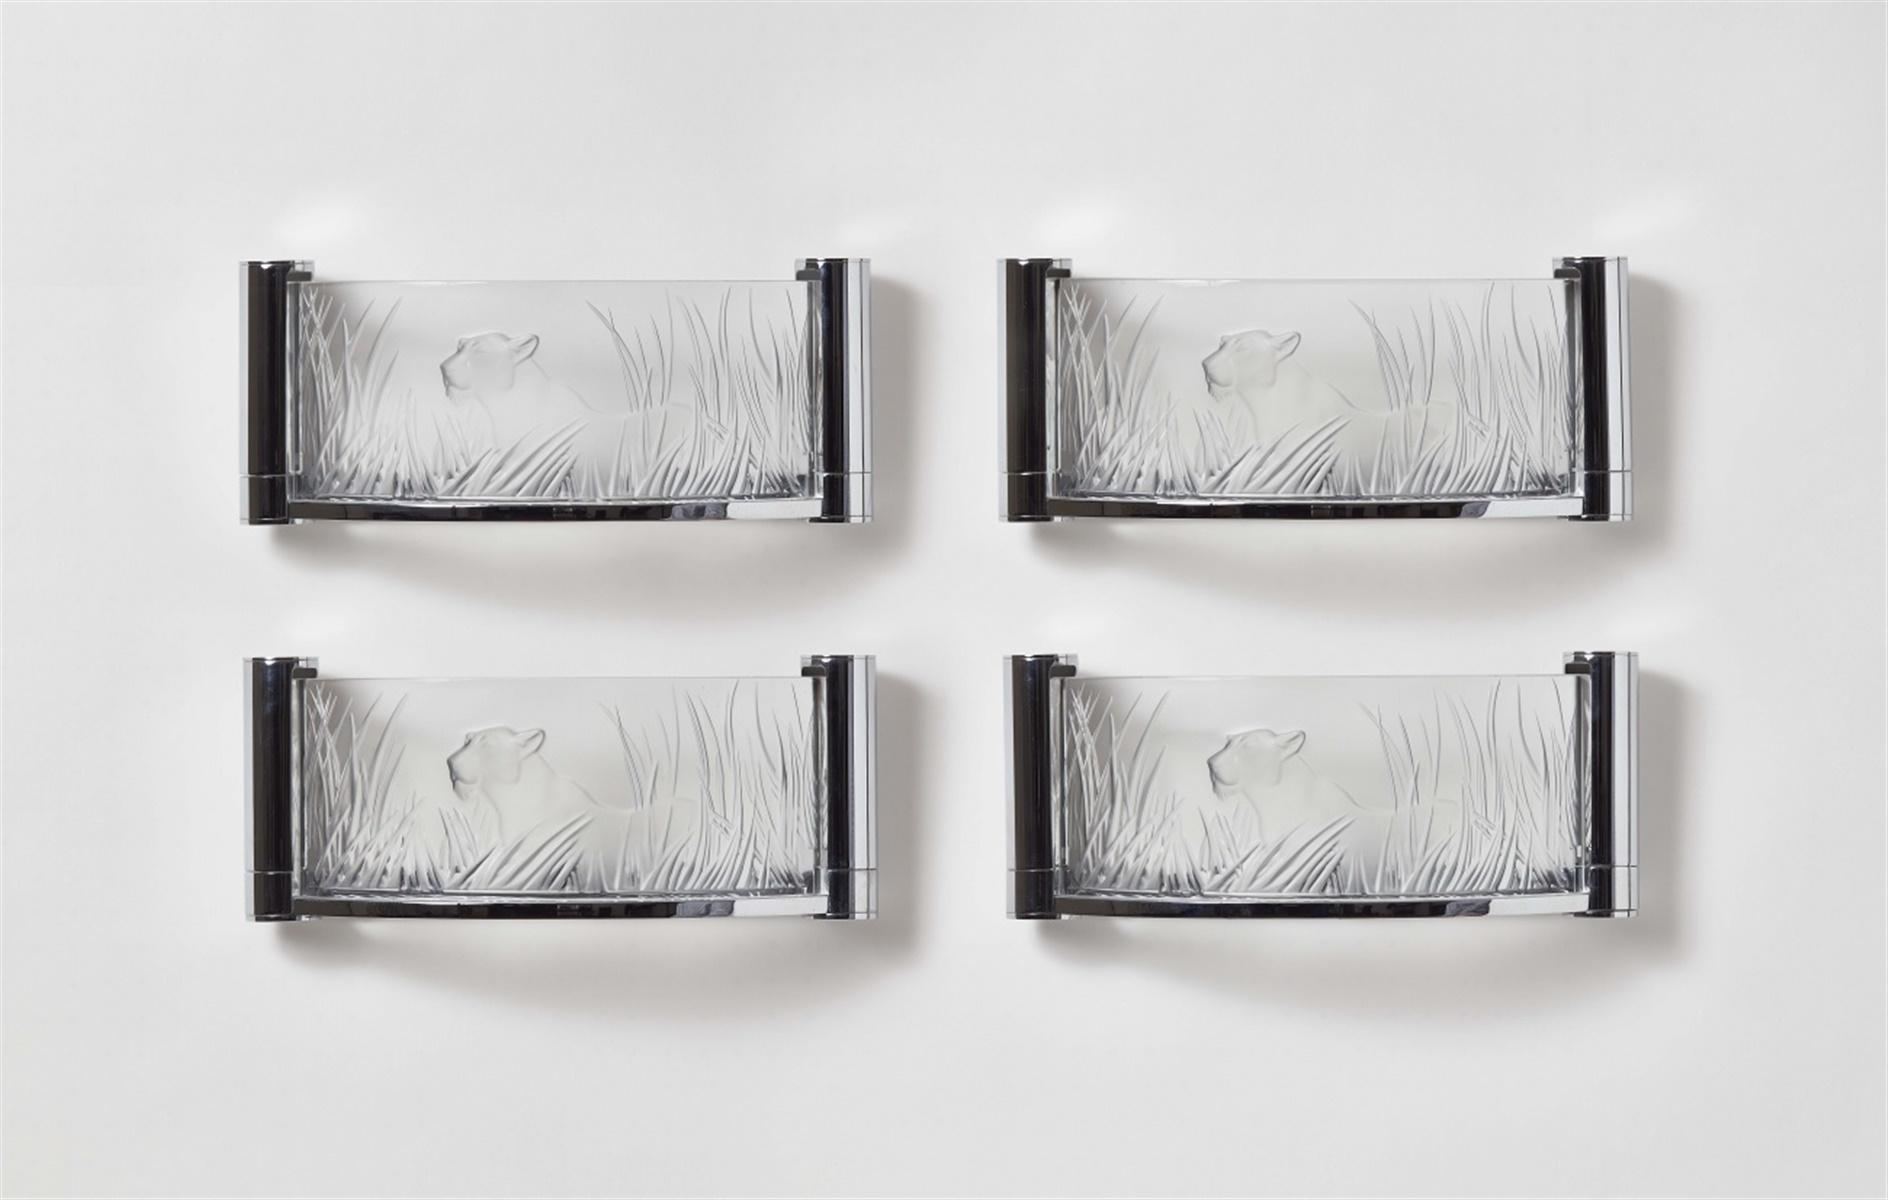 Lot 56 - Satz von vier Appliques KoraModelgeformtes Glas, verchromtes Metall. Geätzte Signatur Lalique